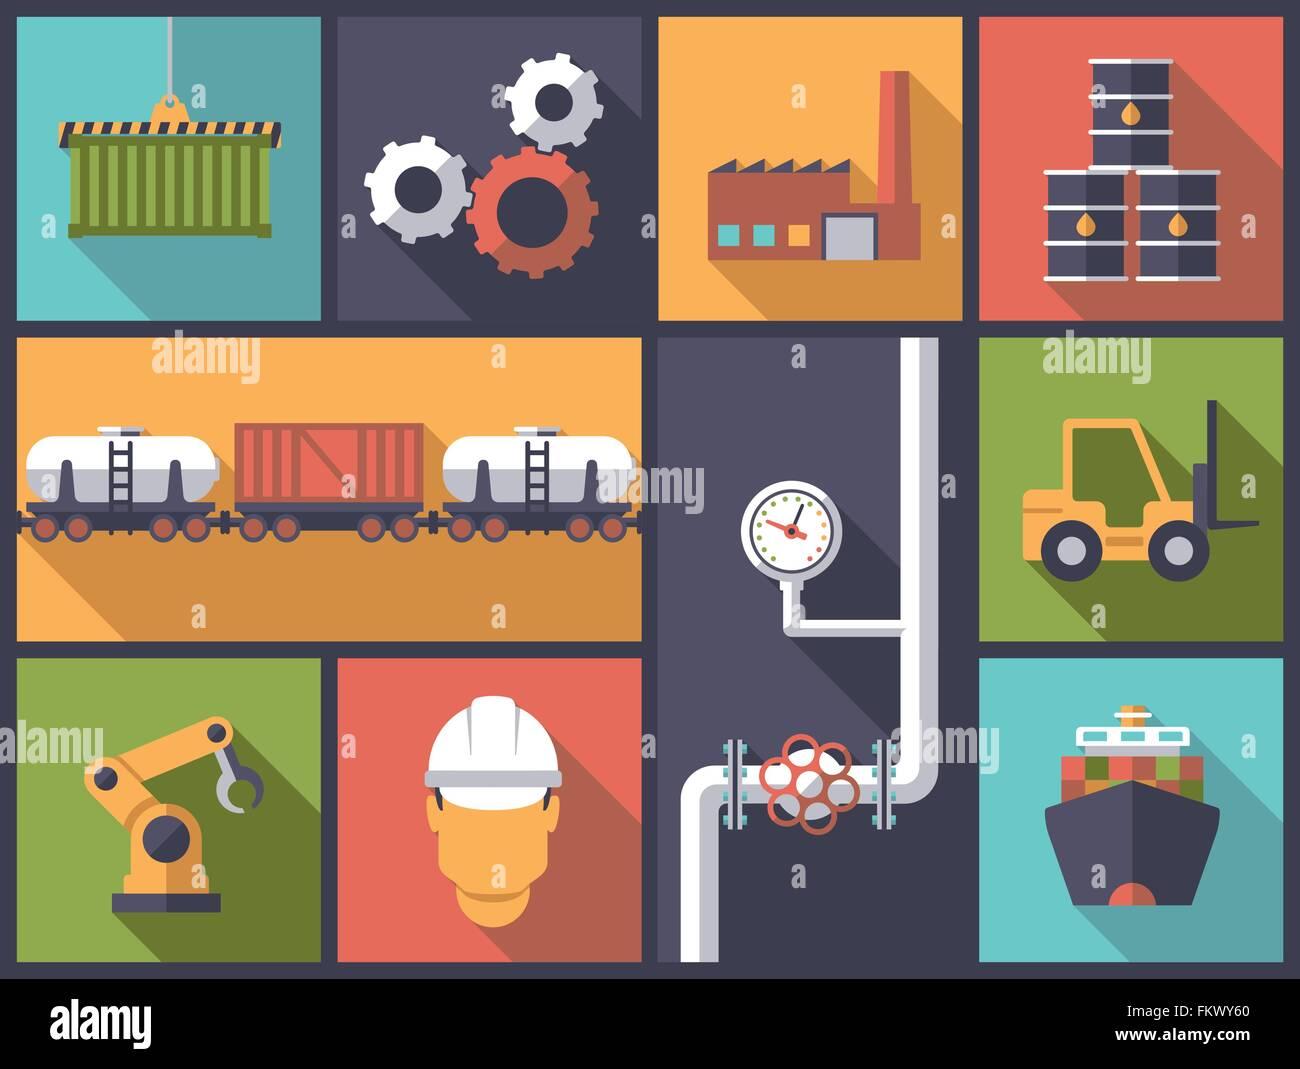 Horizontal flat design illustration with industry symbols - Stock Vector